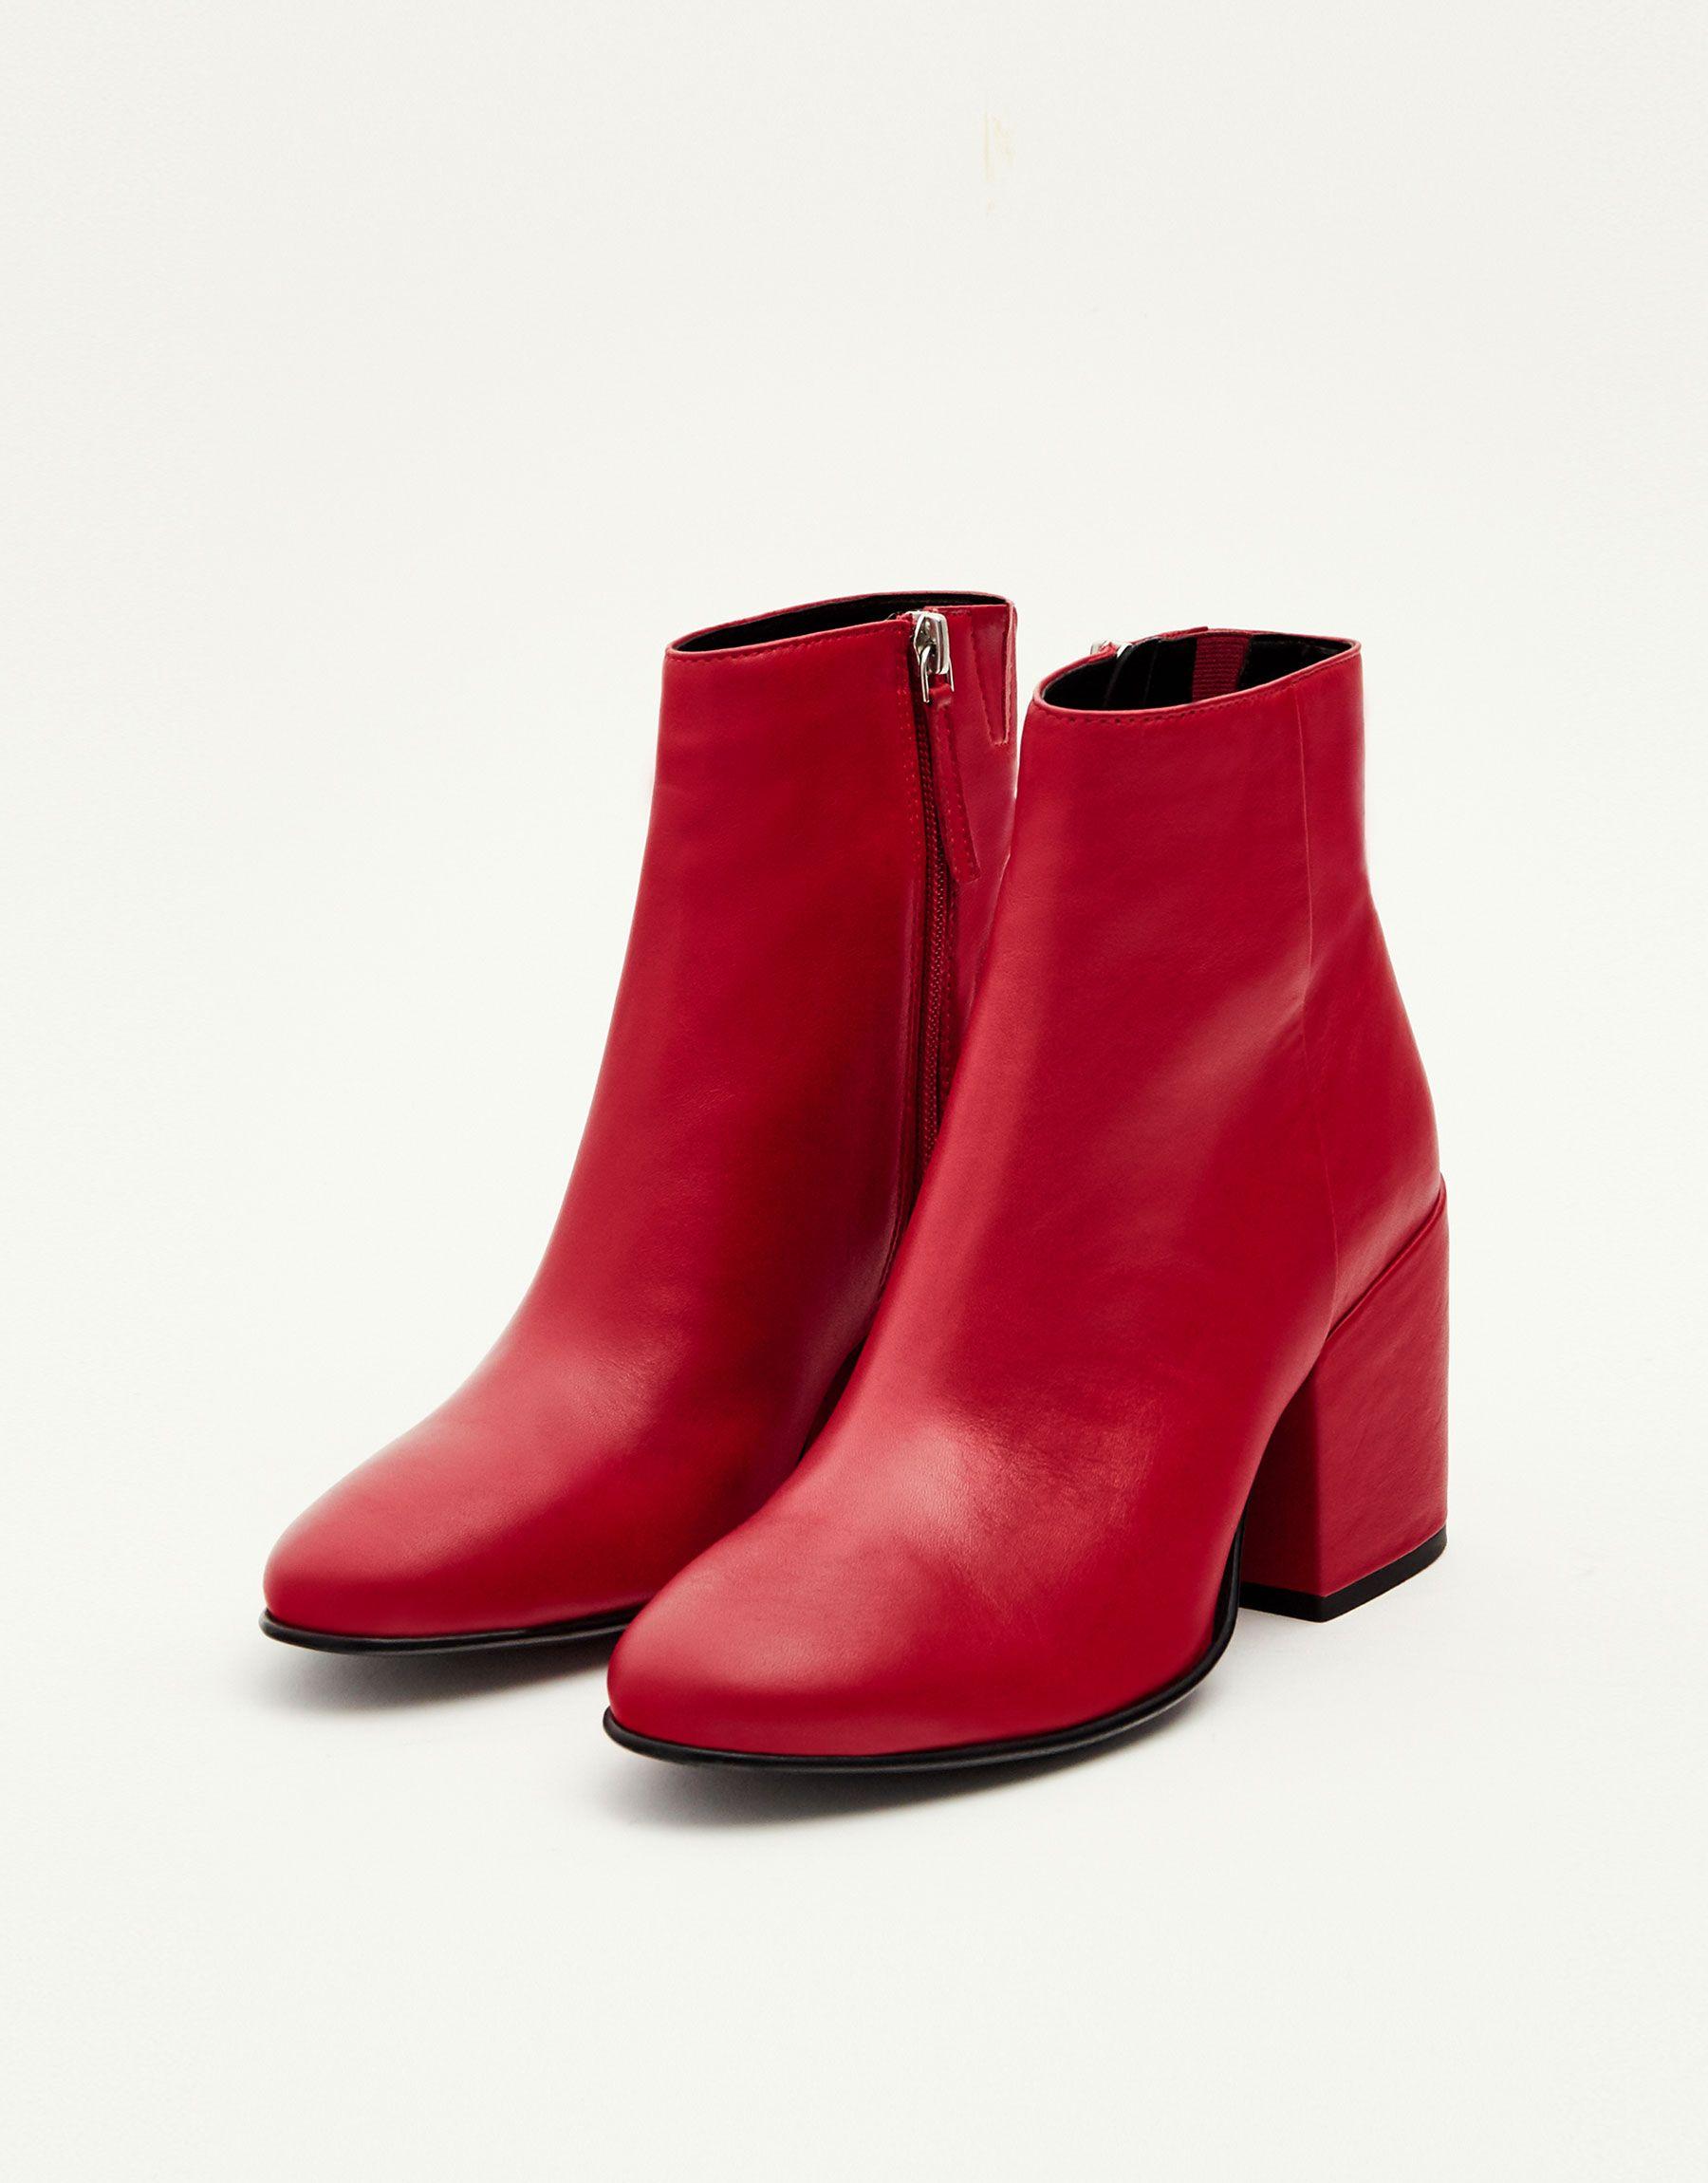 Todo Zapatos amp;bear Ver Piel Pull Tacón Botín Mujer Rojo IXqPxXpzw